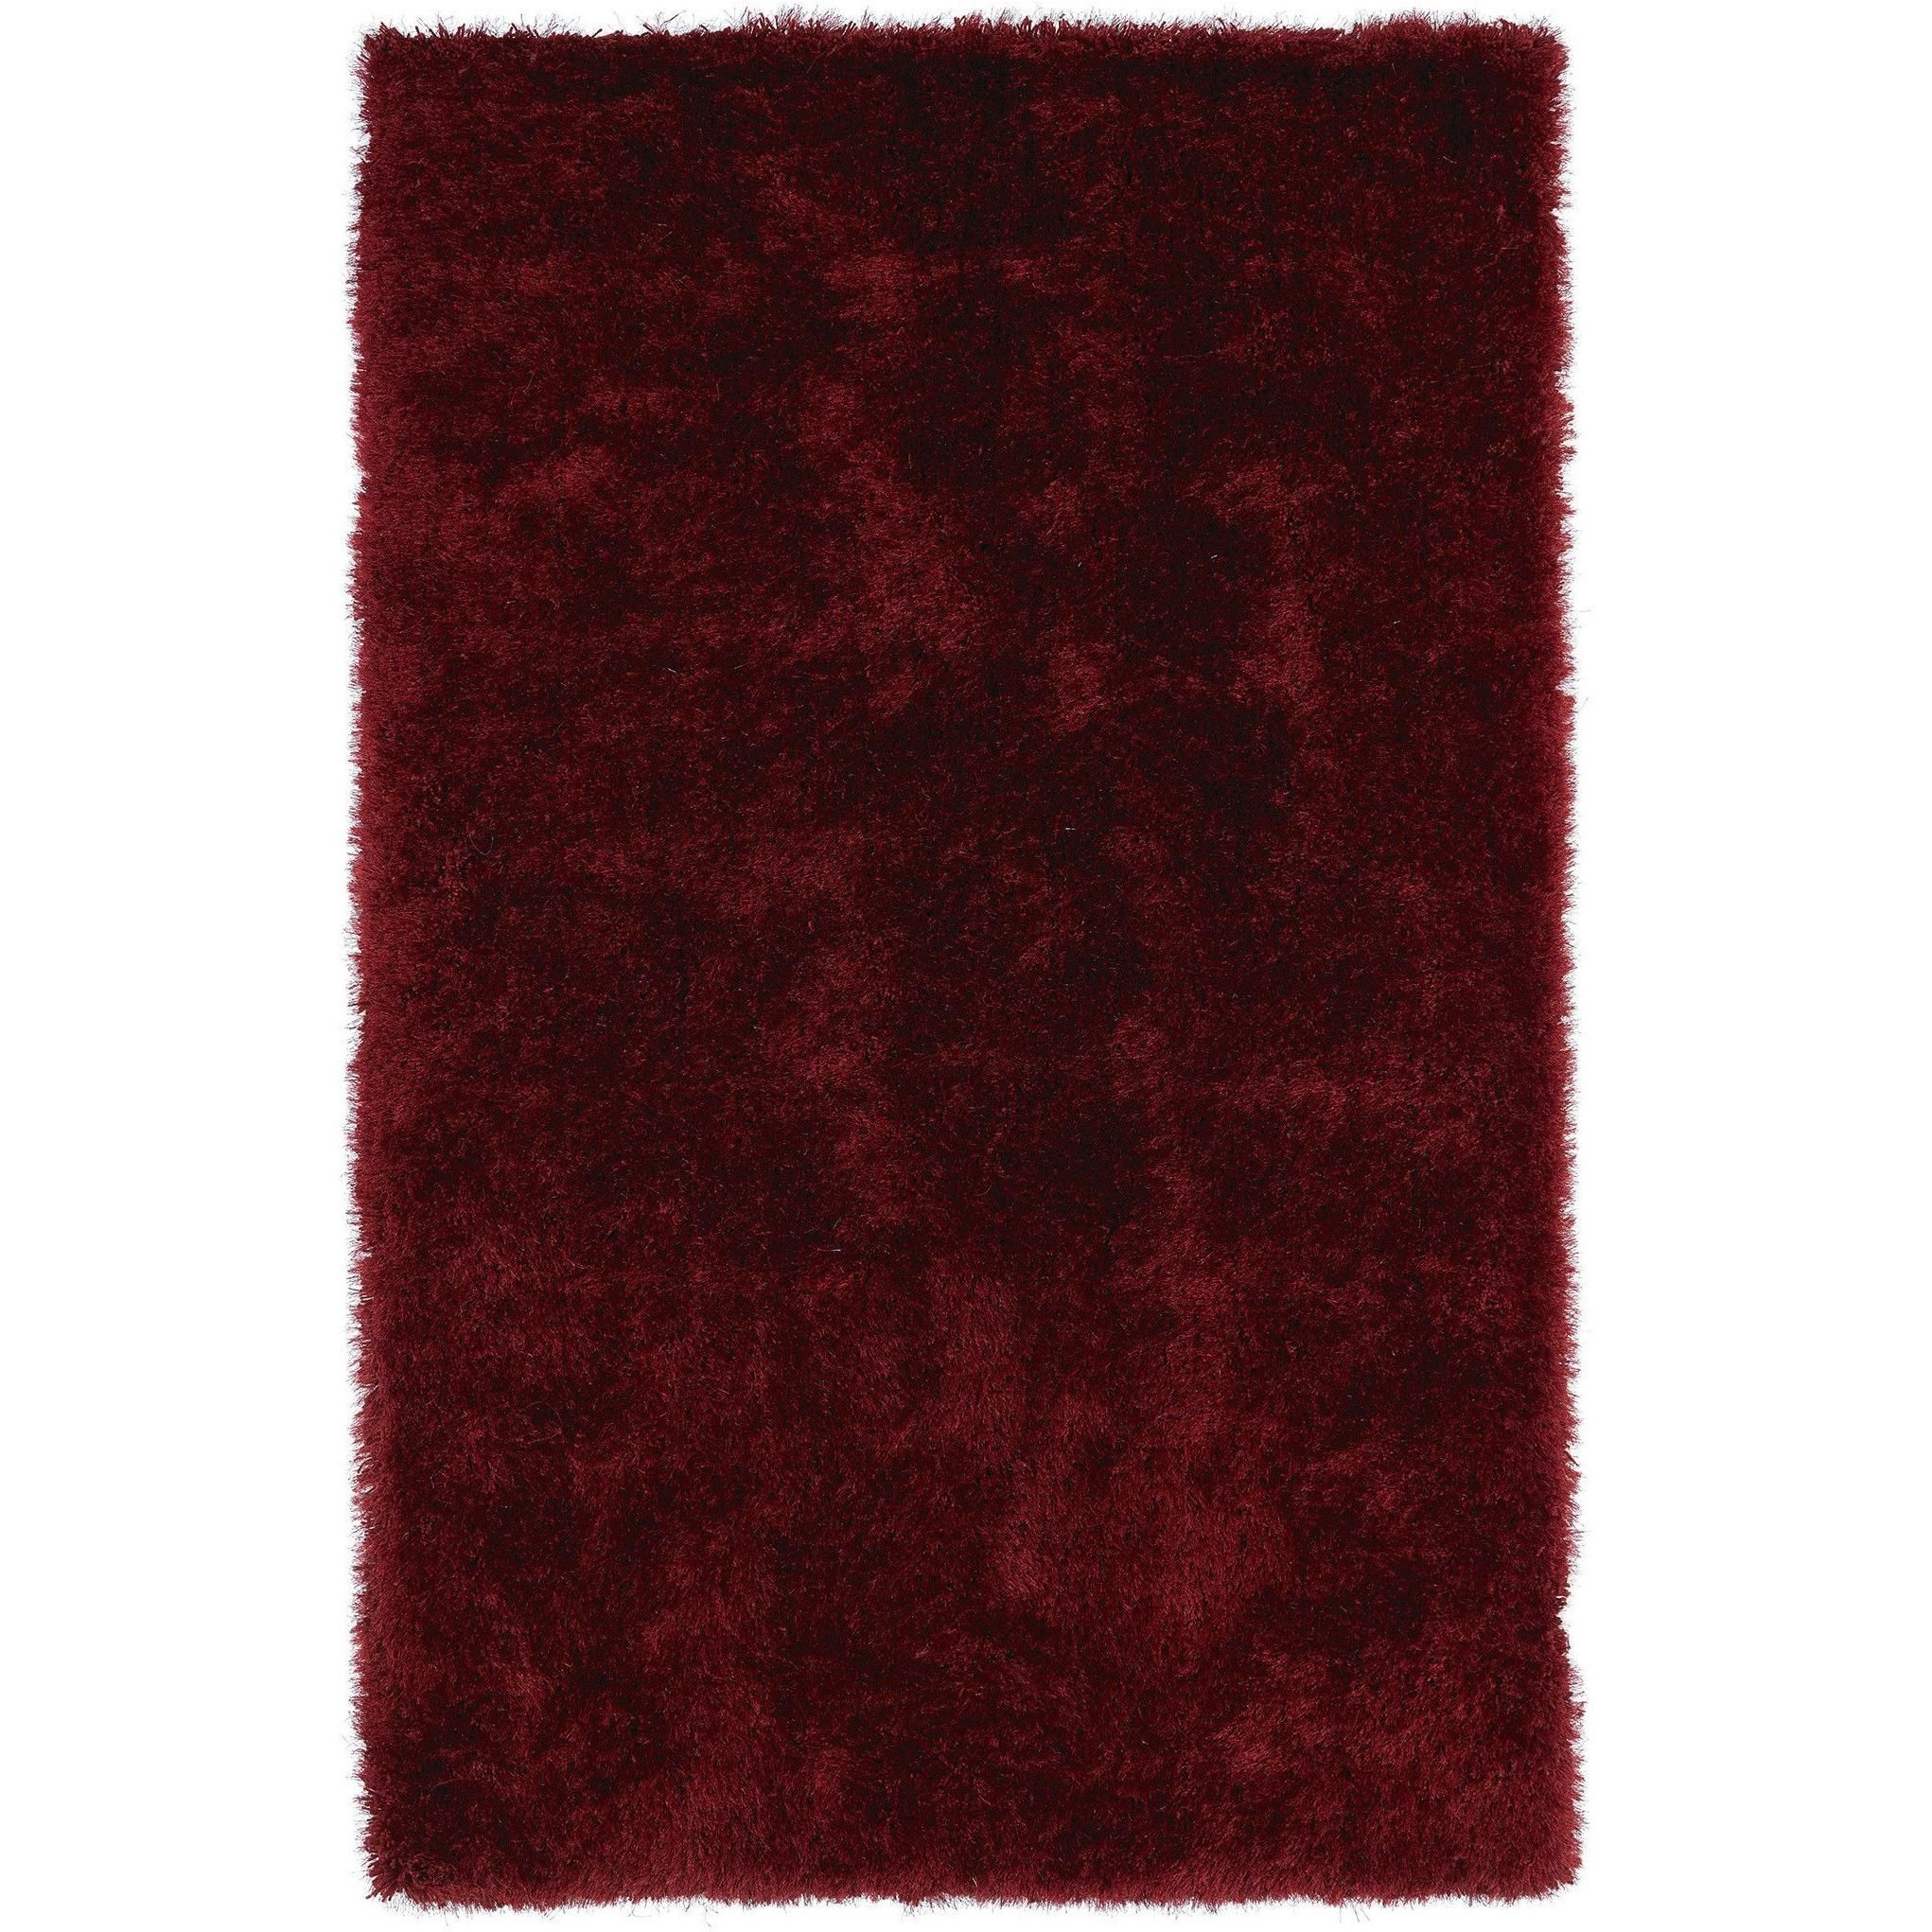 kaleen rugs posh collection psh0106 brick shag rug